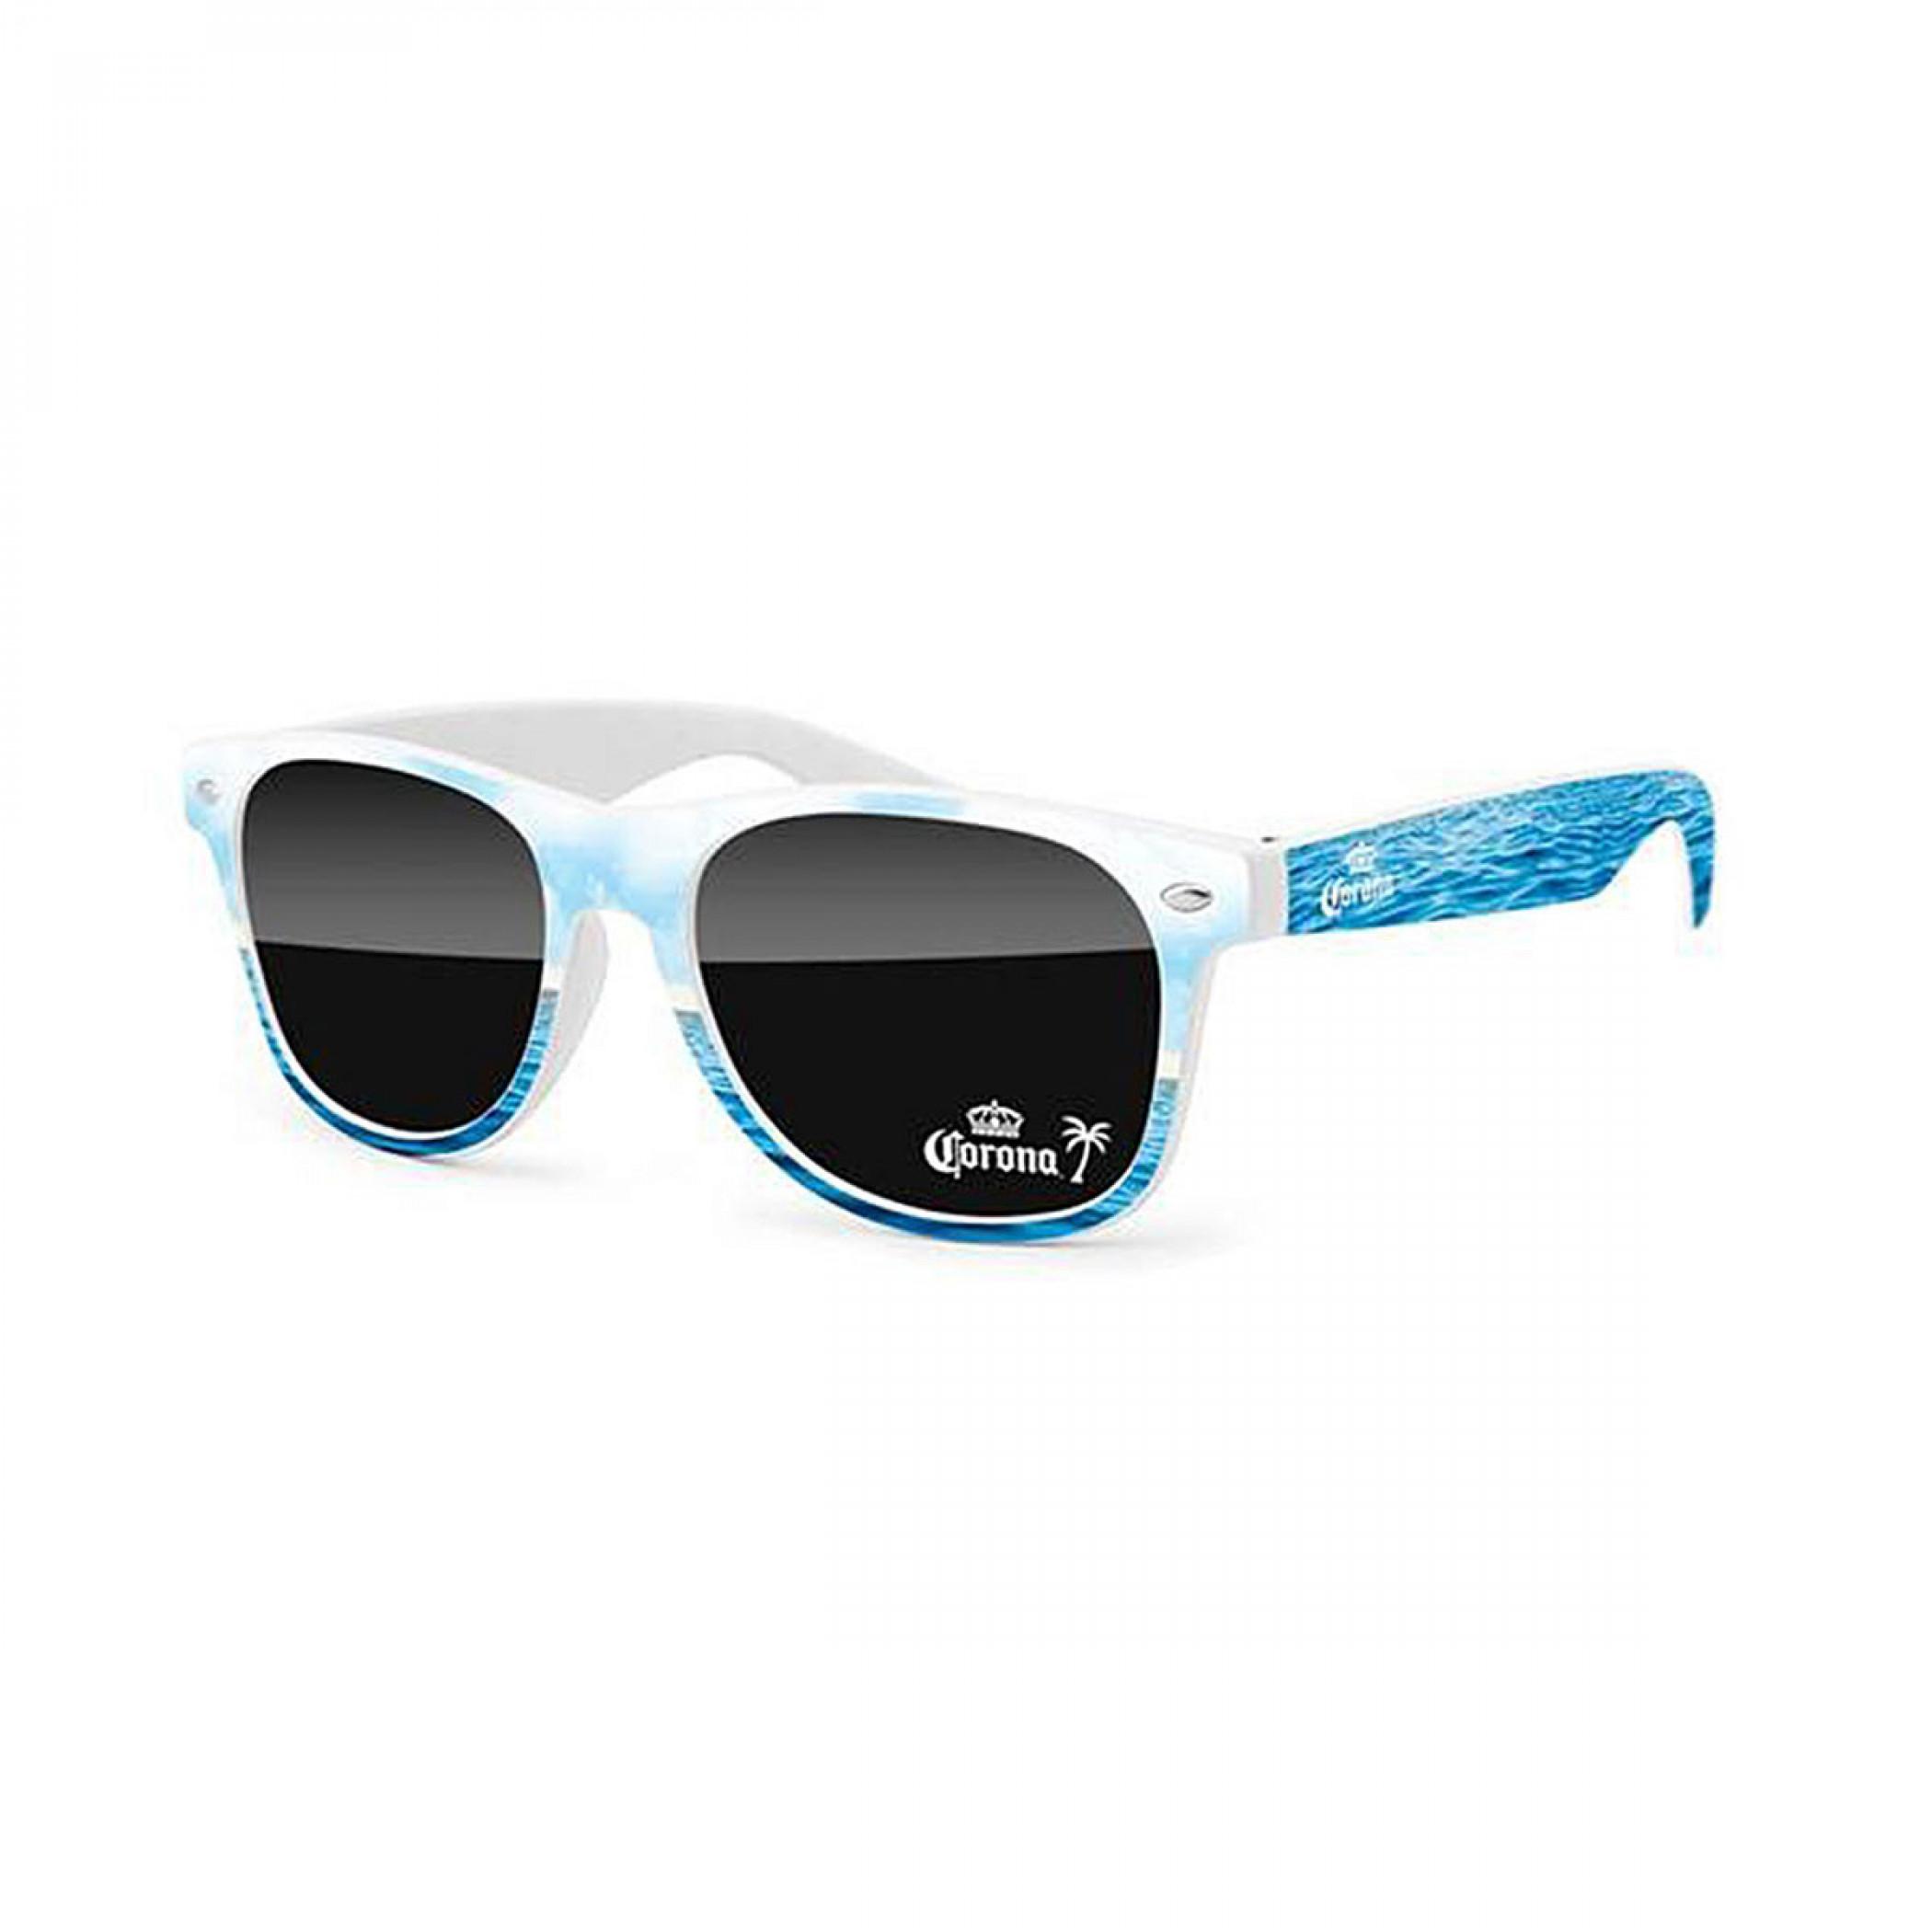 Corona Extra Summer Sunglasses